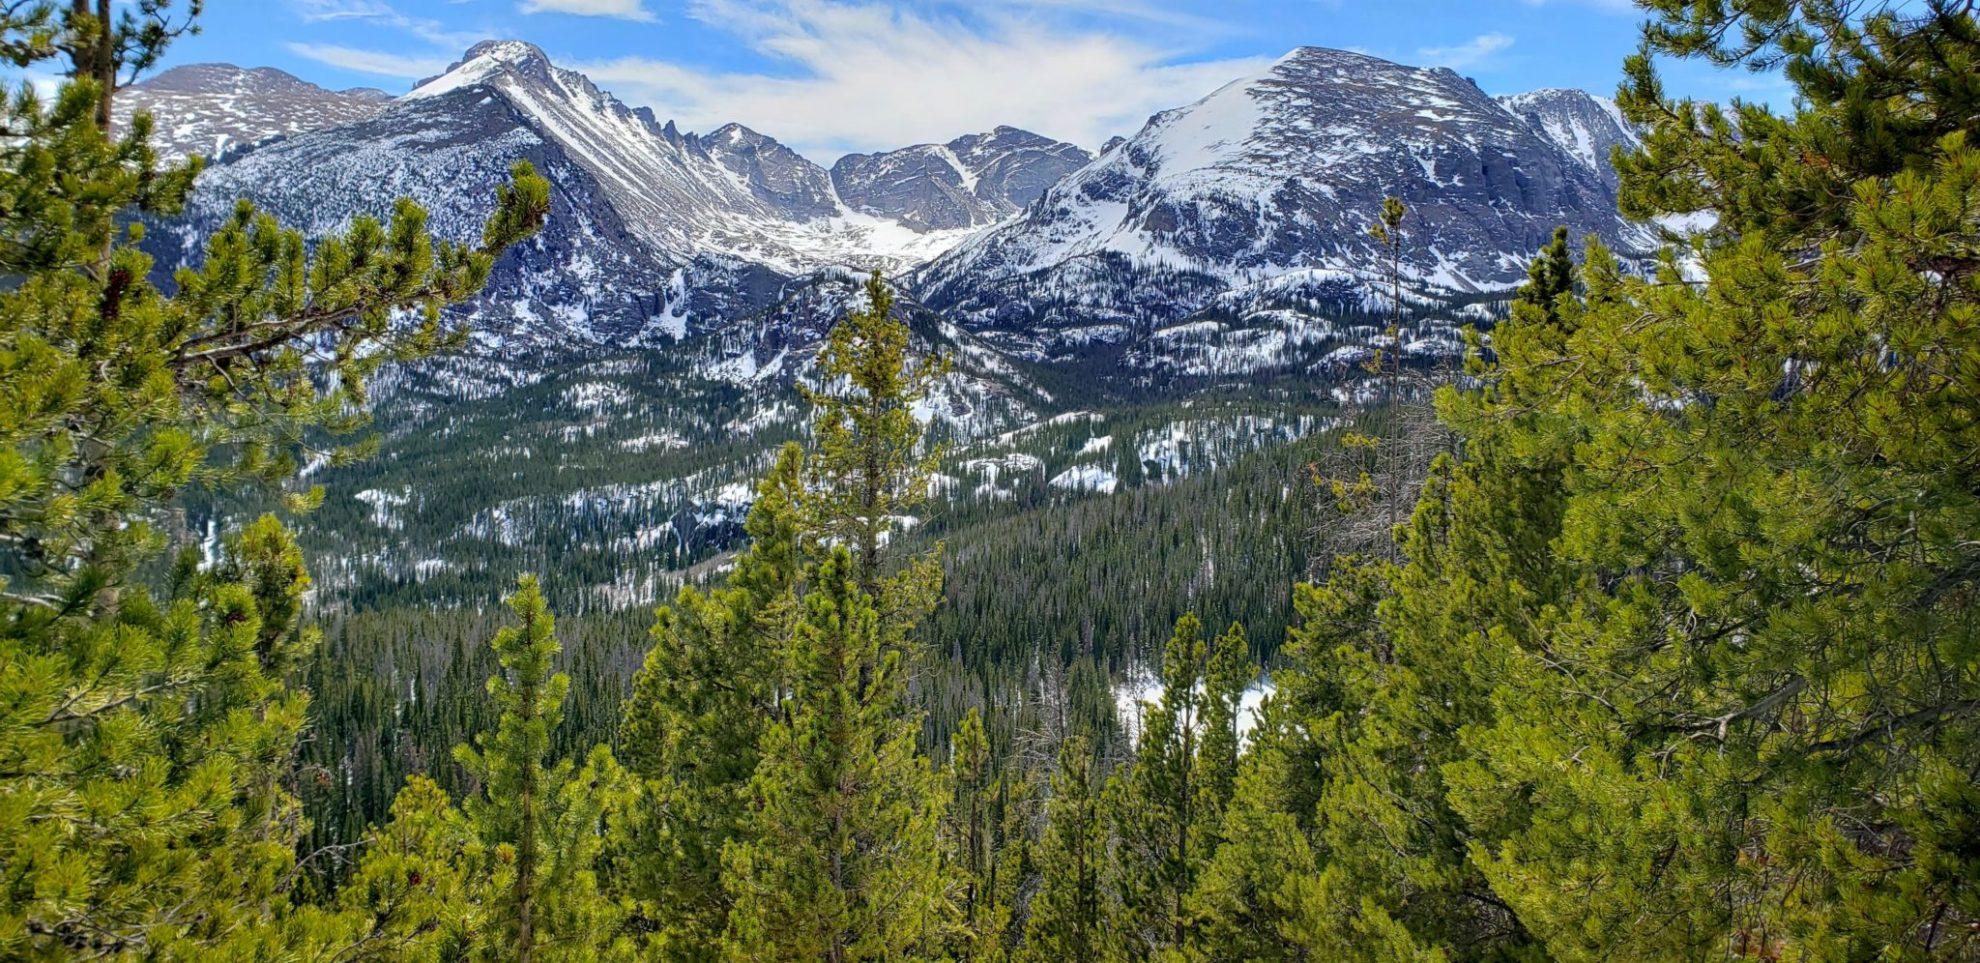 Incredible views of the Longs Peak area of the park